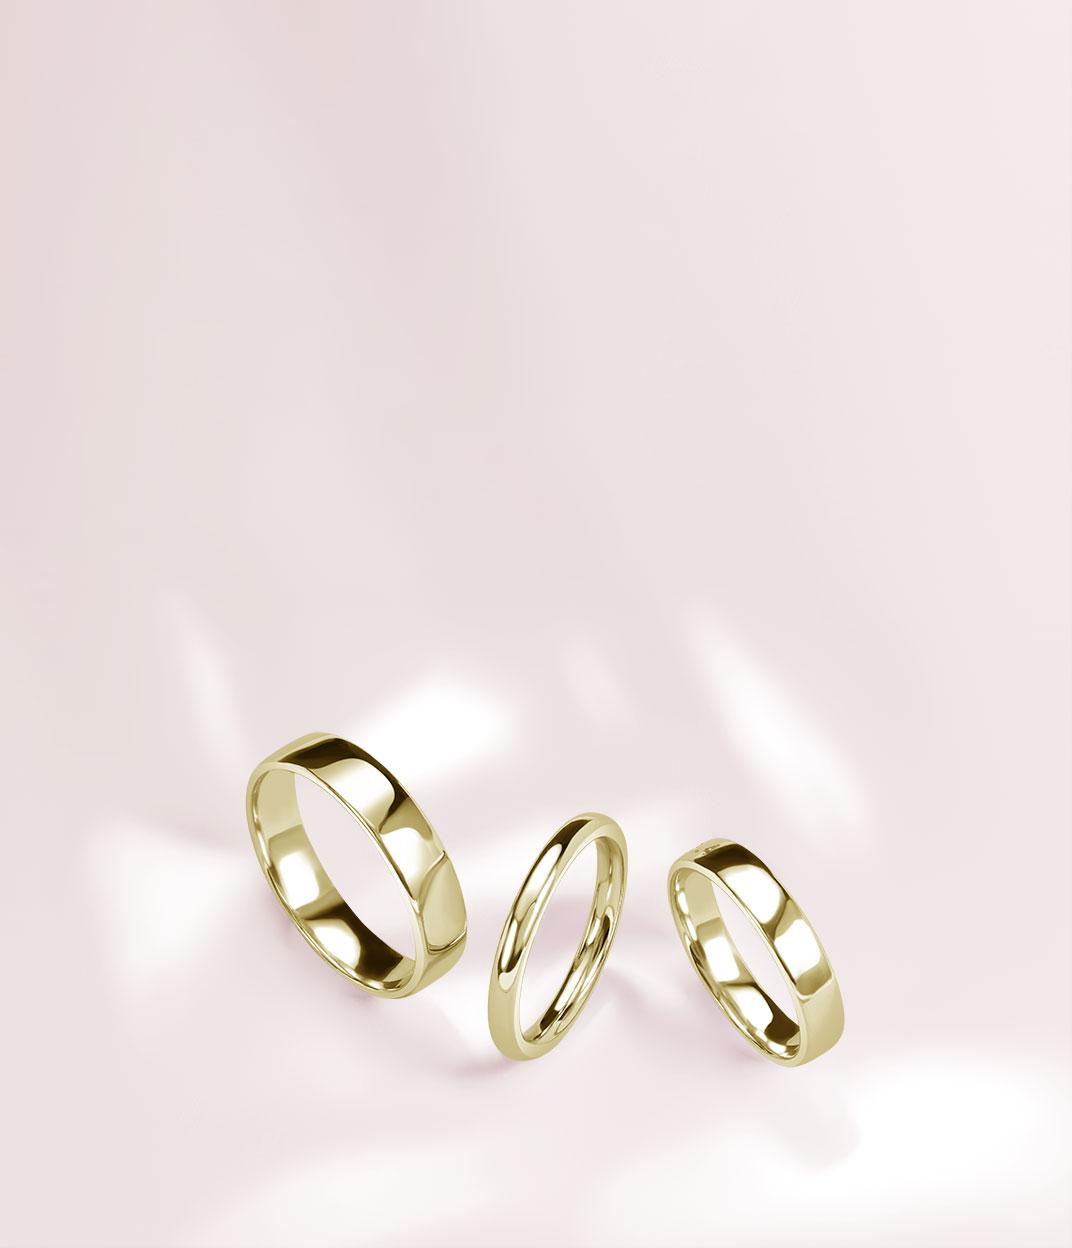 Yellow Gold Plain Wedding Rings - Steven Stone